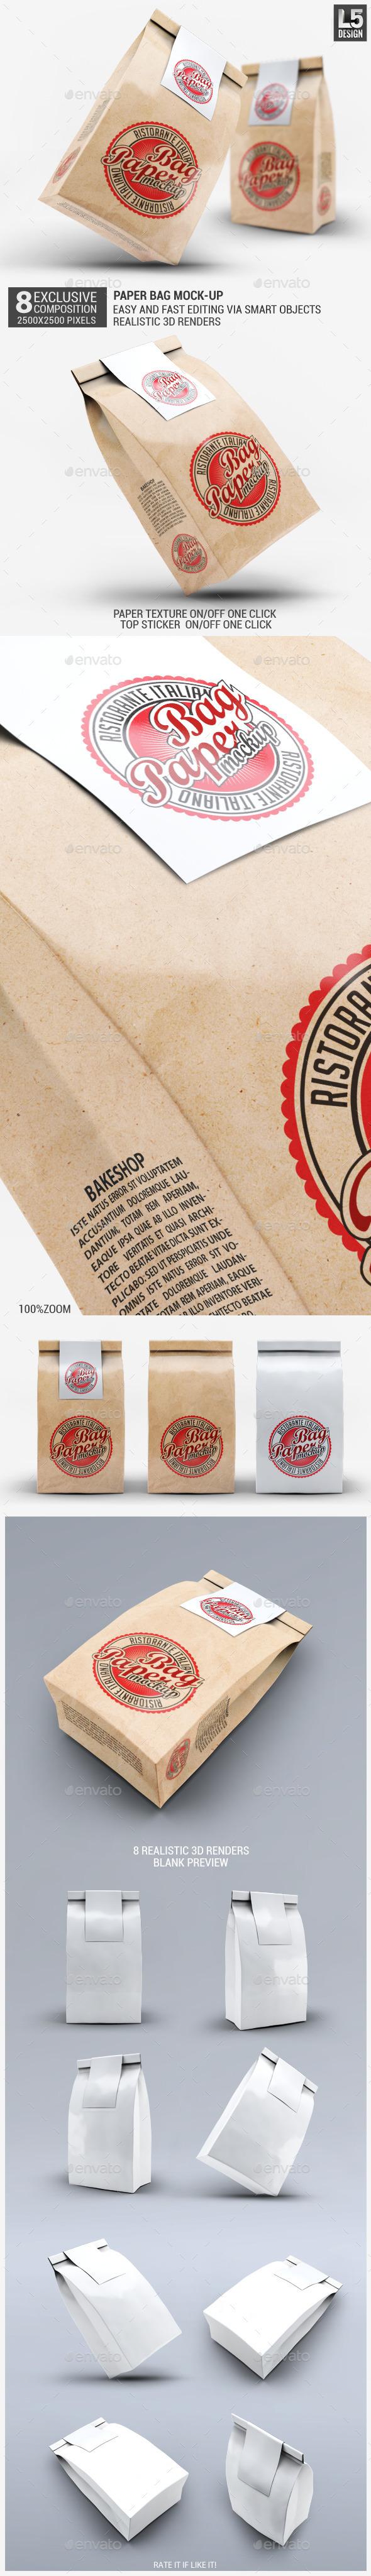 Paper Bag Mock-Up - Food and Drink Packaging